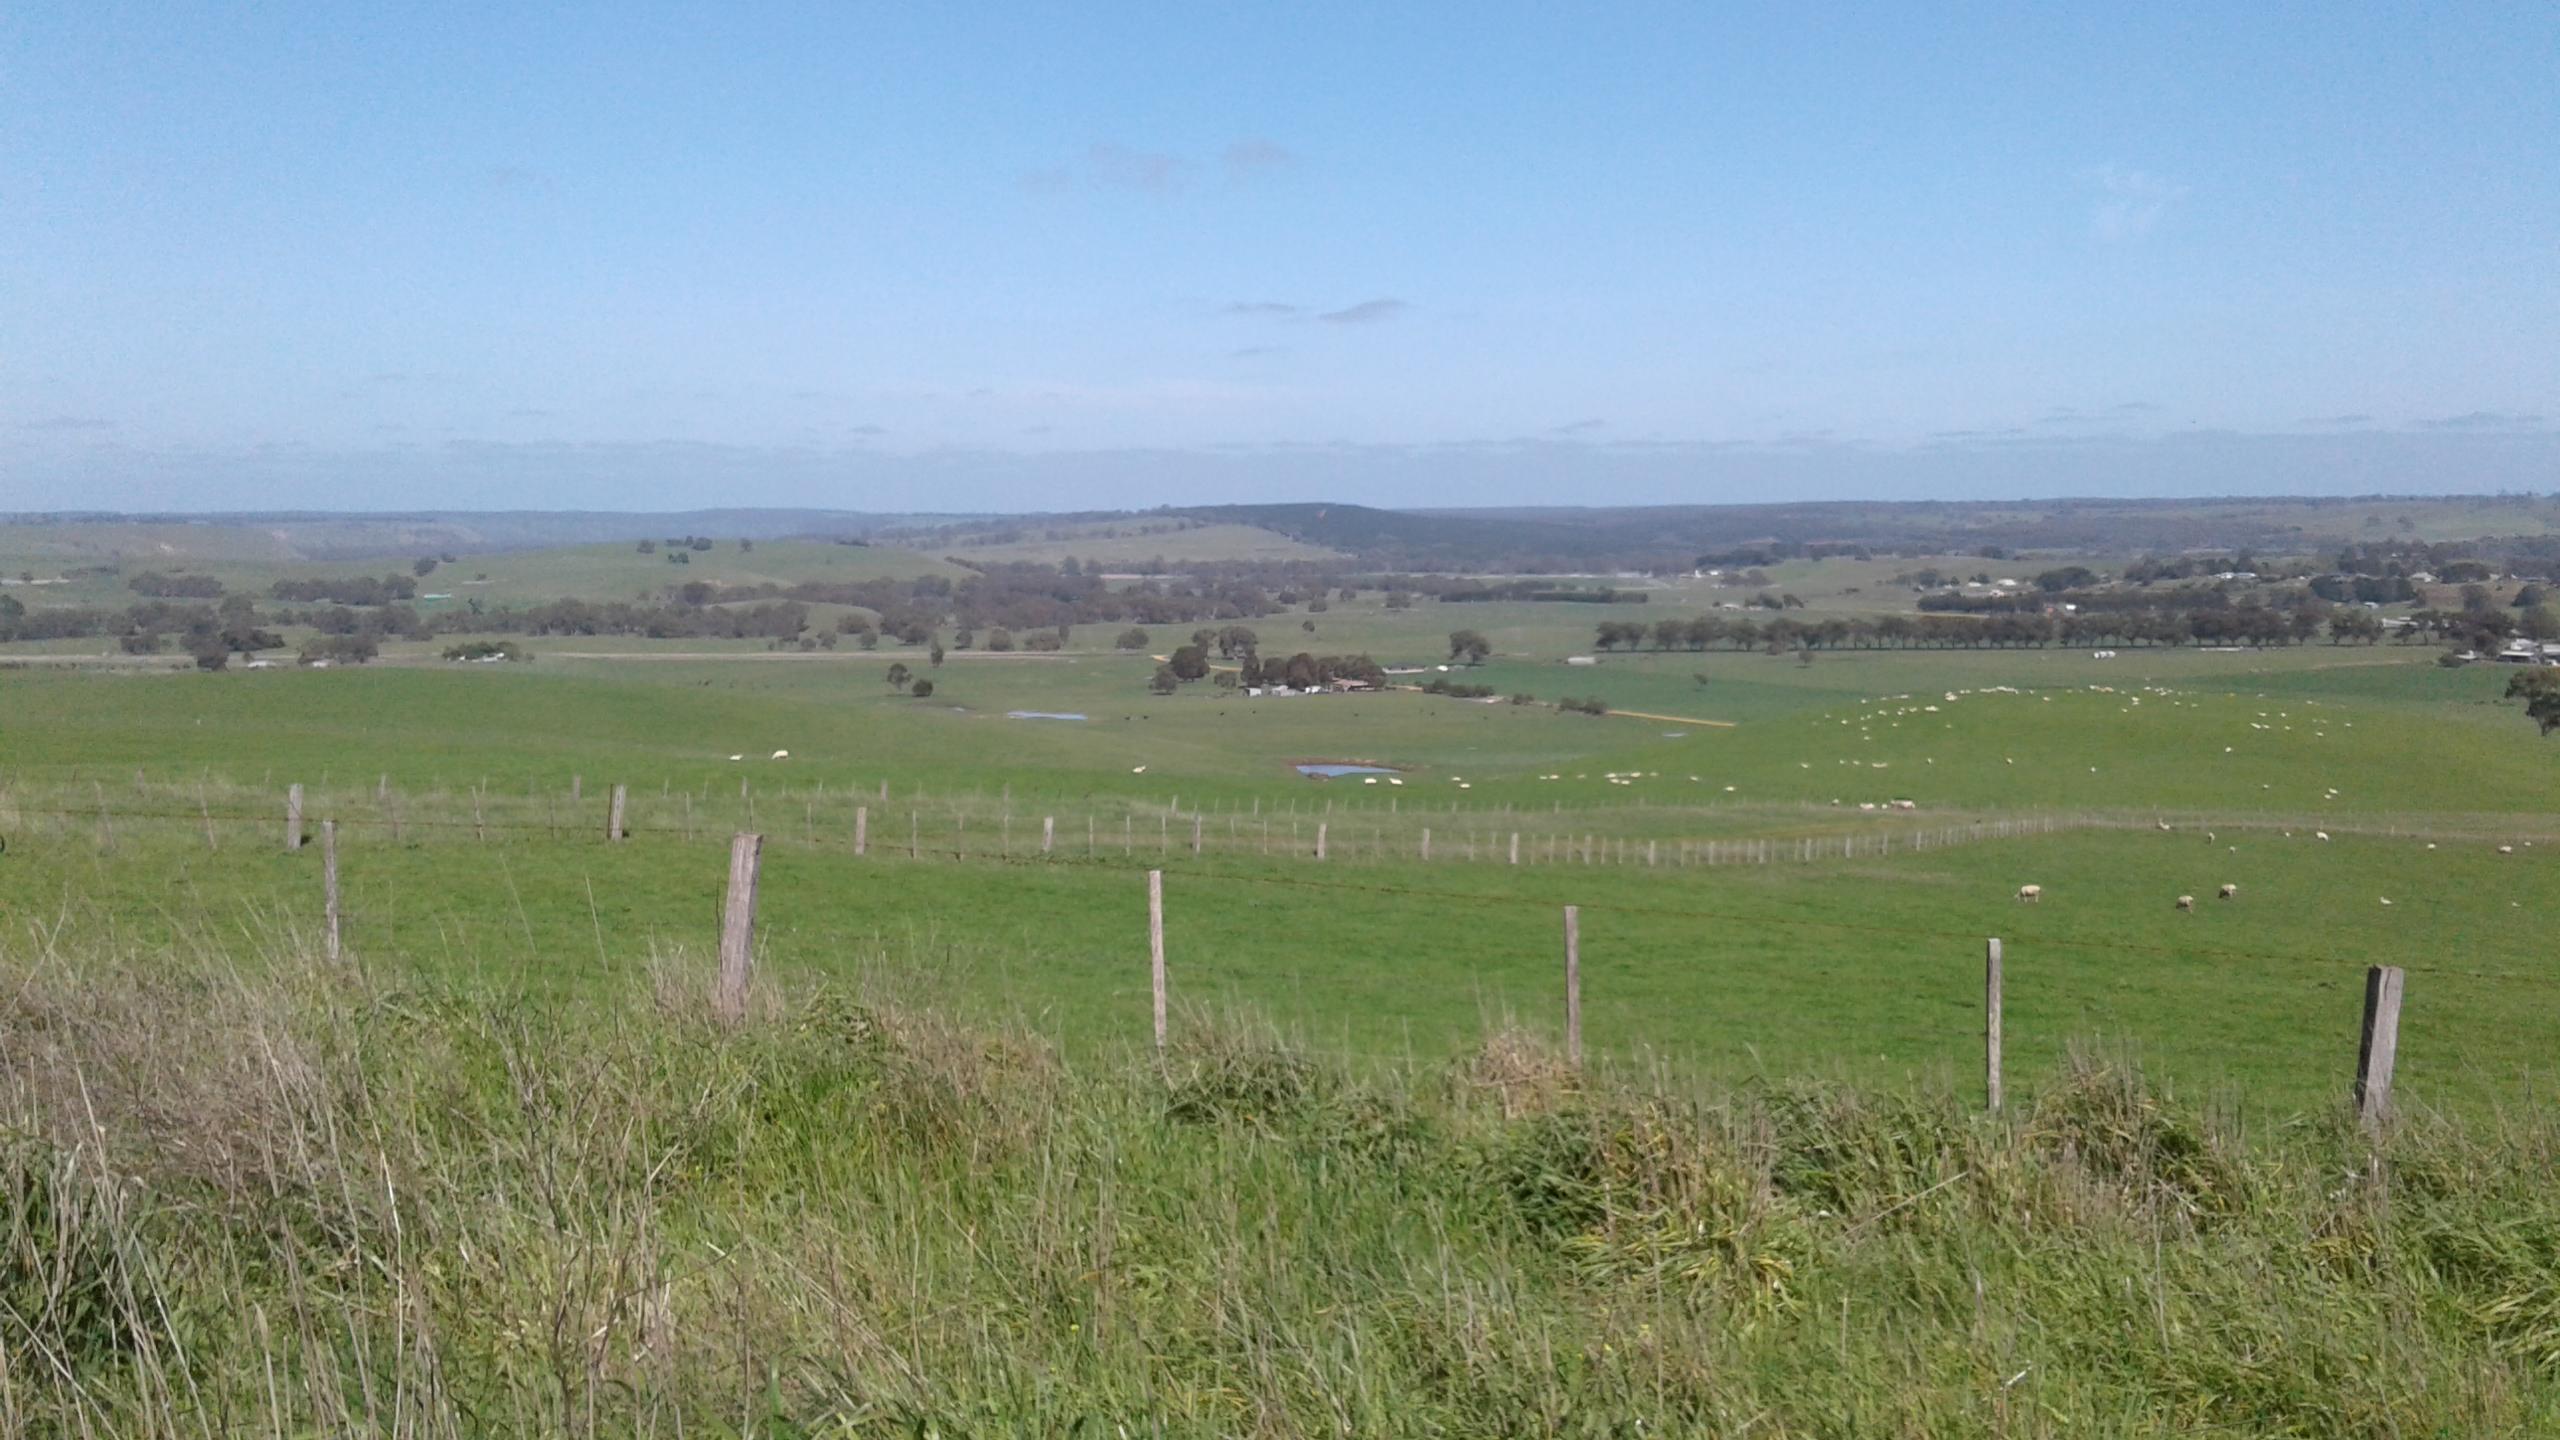 The Australian countryside.